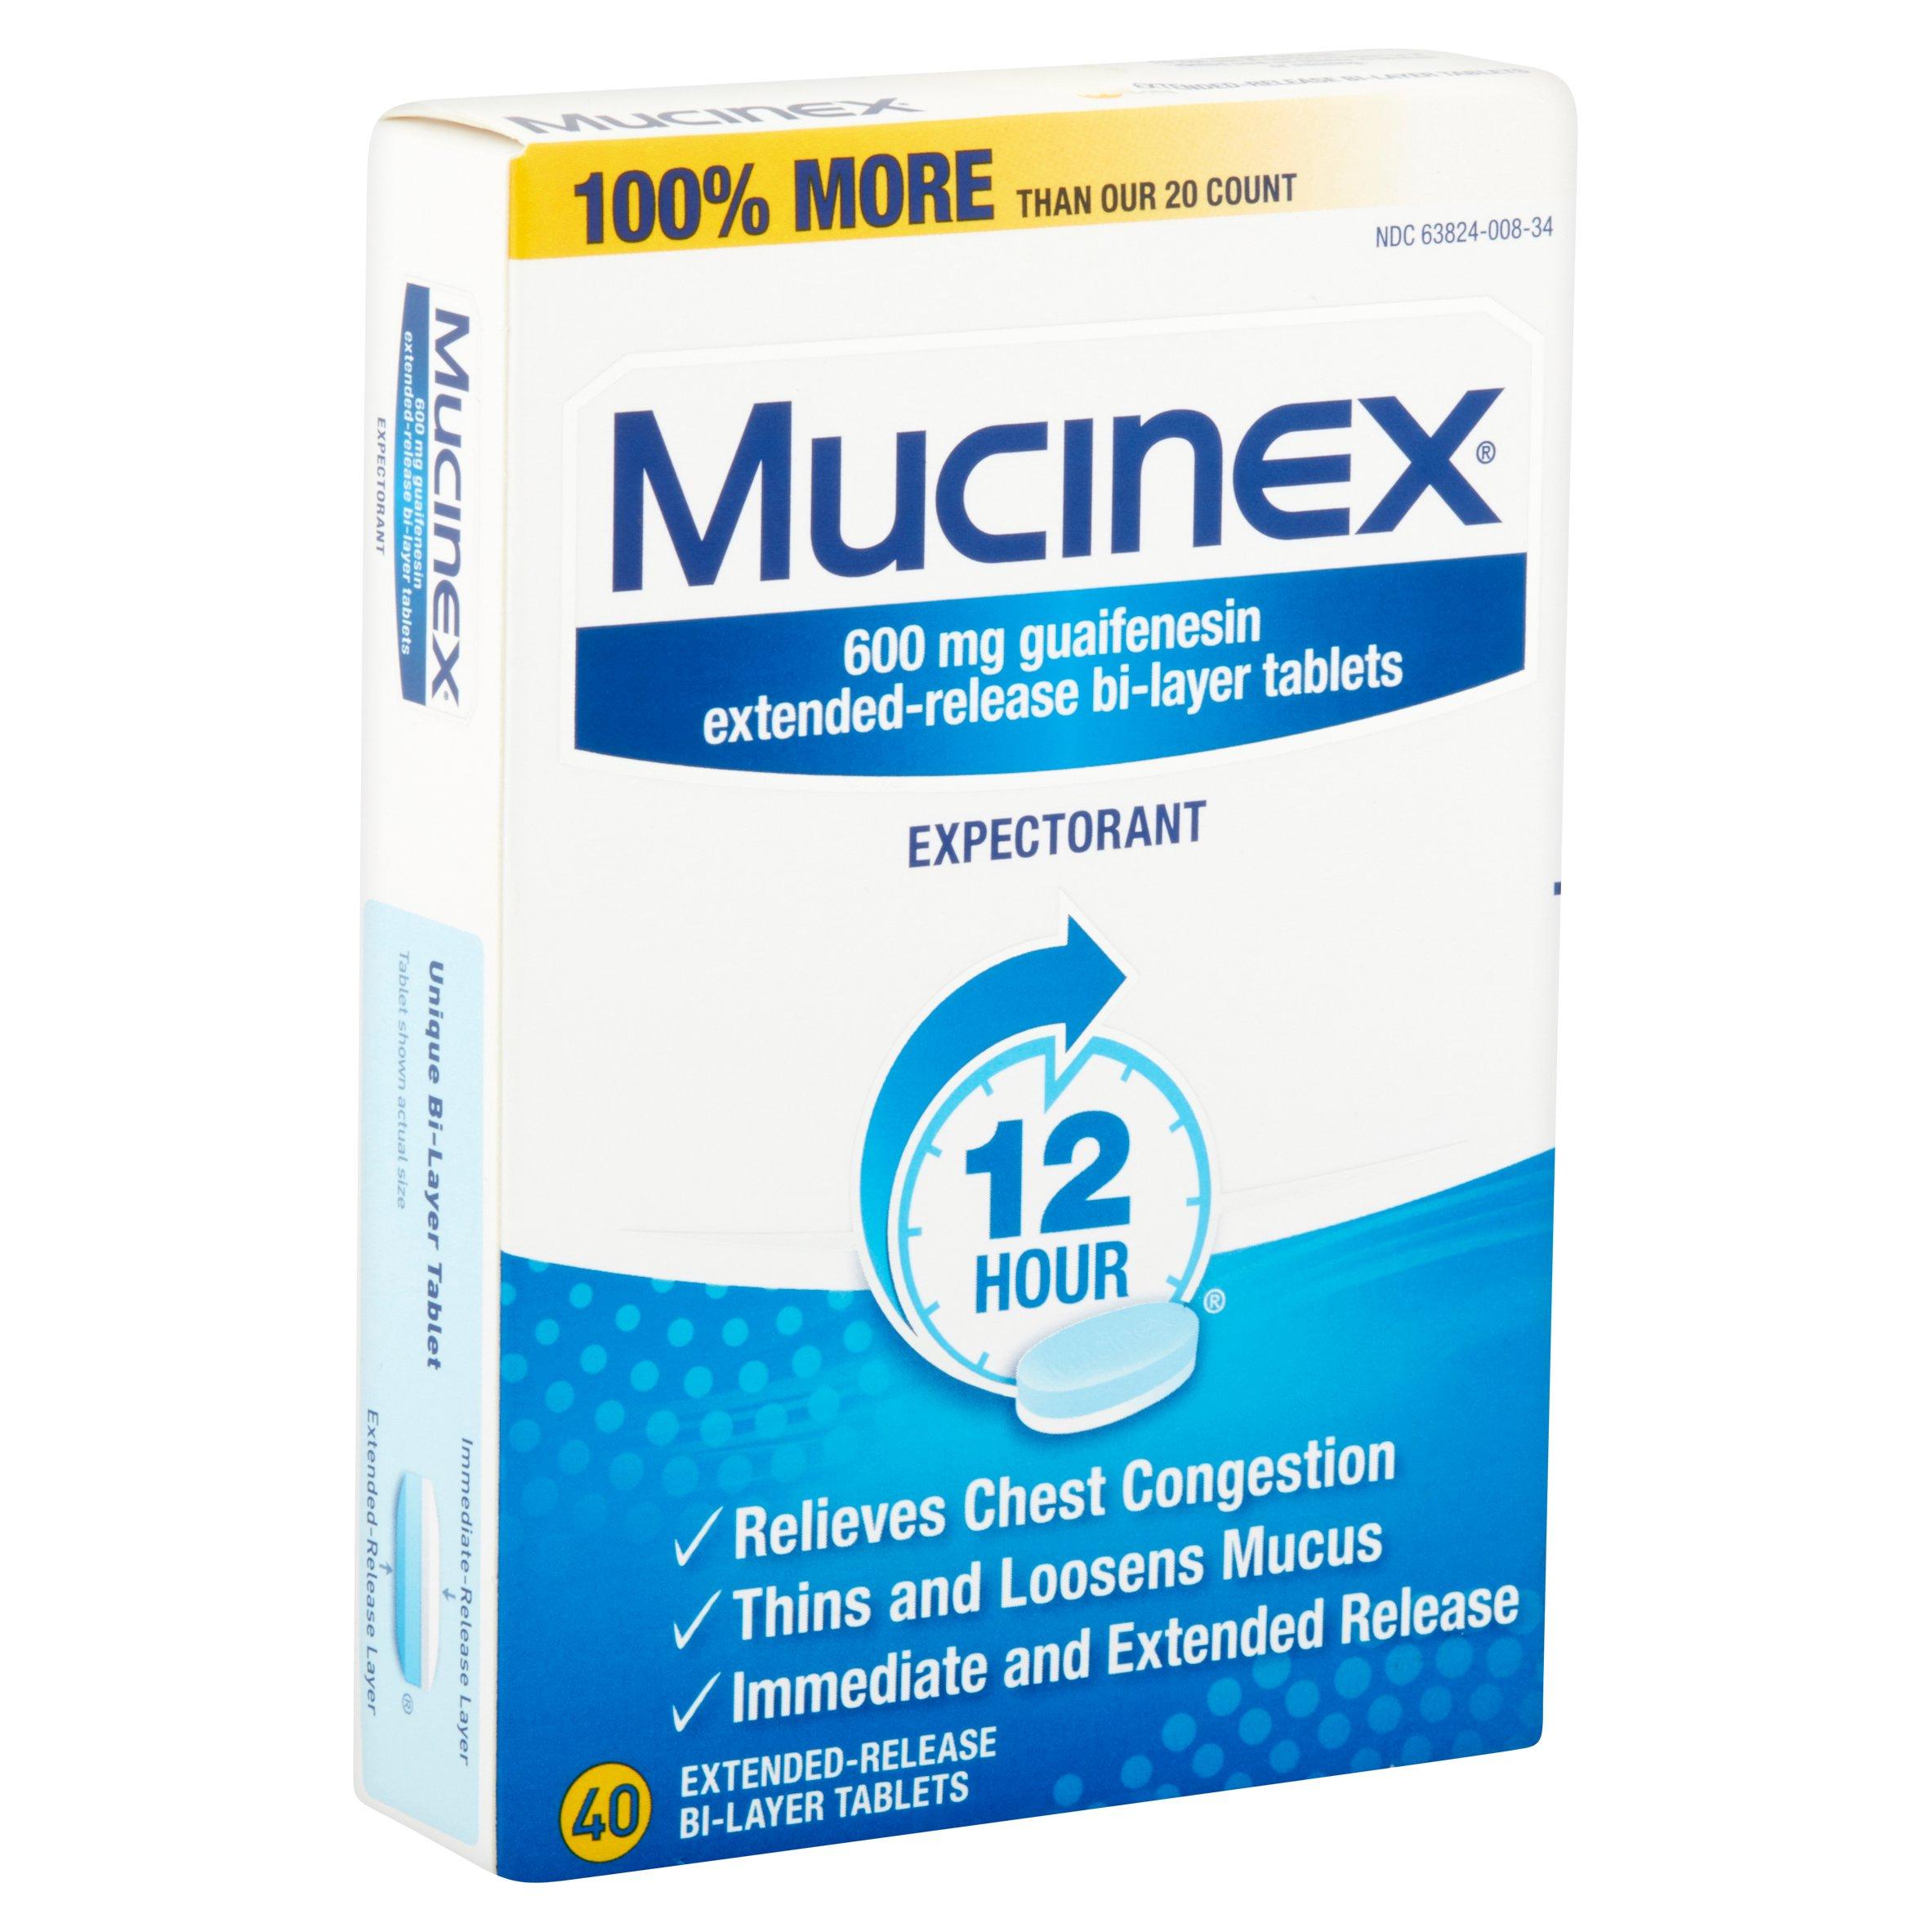 Mucinex Expectorant 600 mg Guaifenesin Extended Release Bi ...